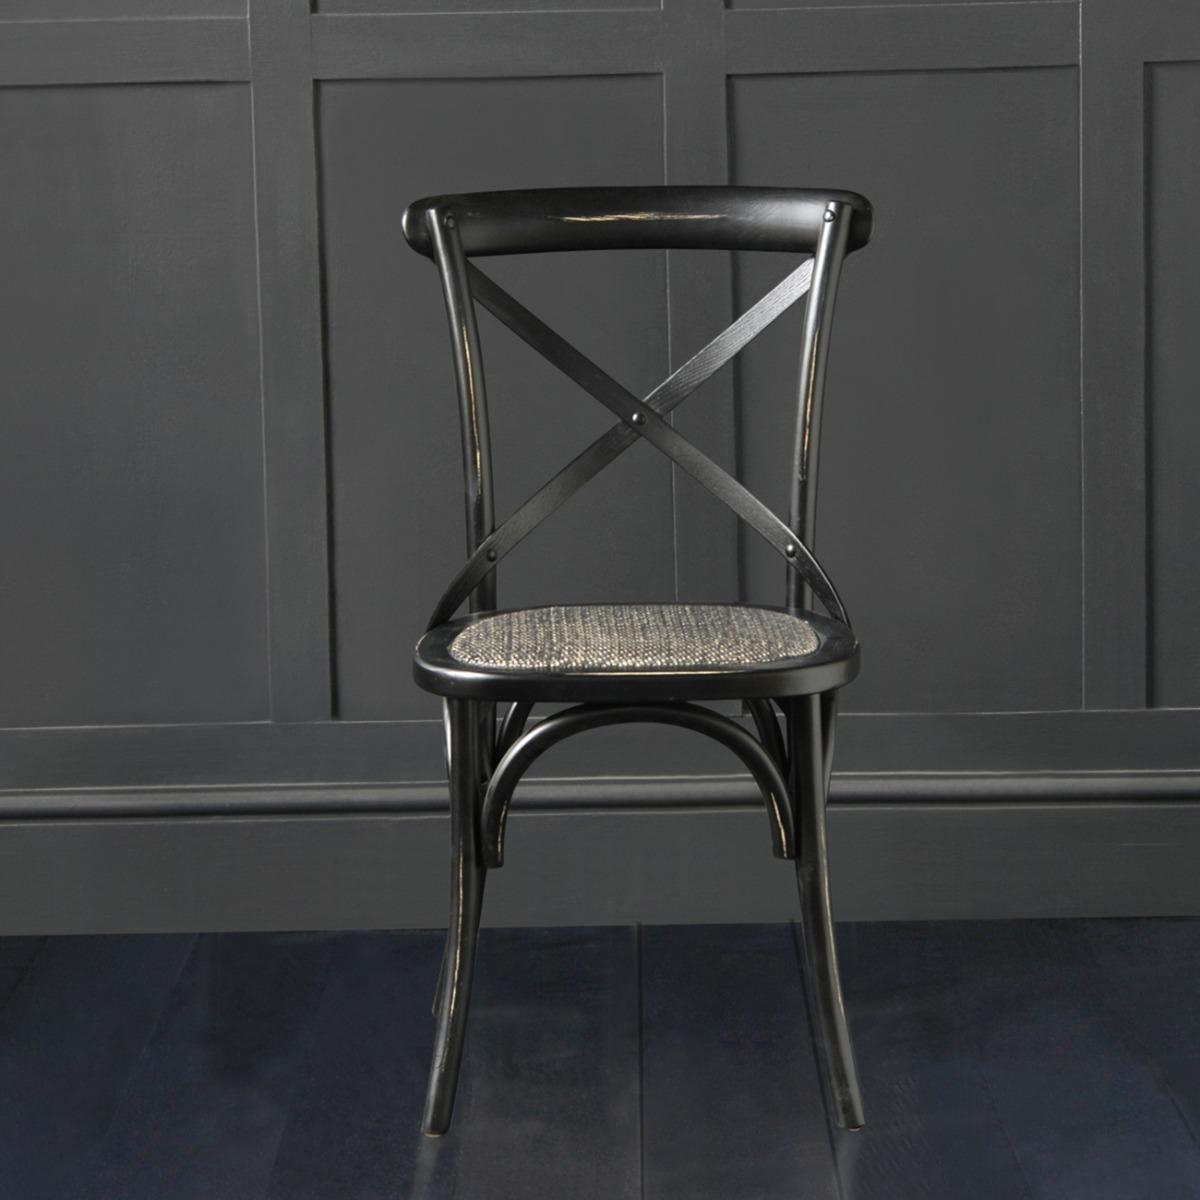 French Cross Back Bentwood Dining Chair, Café / Restaurant / Kitchen / Bistro, Metal Cross Back, Black